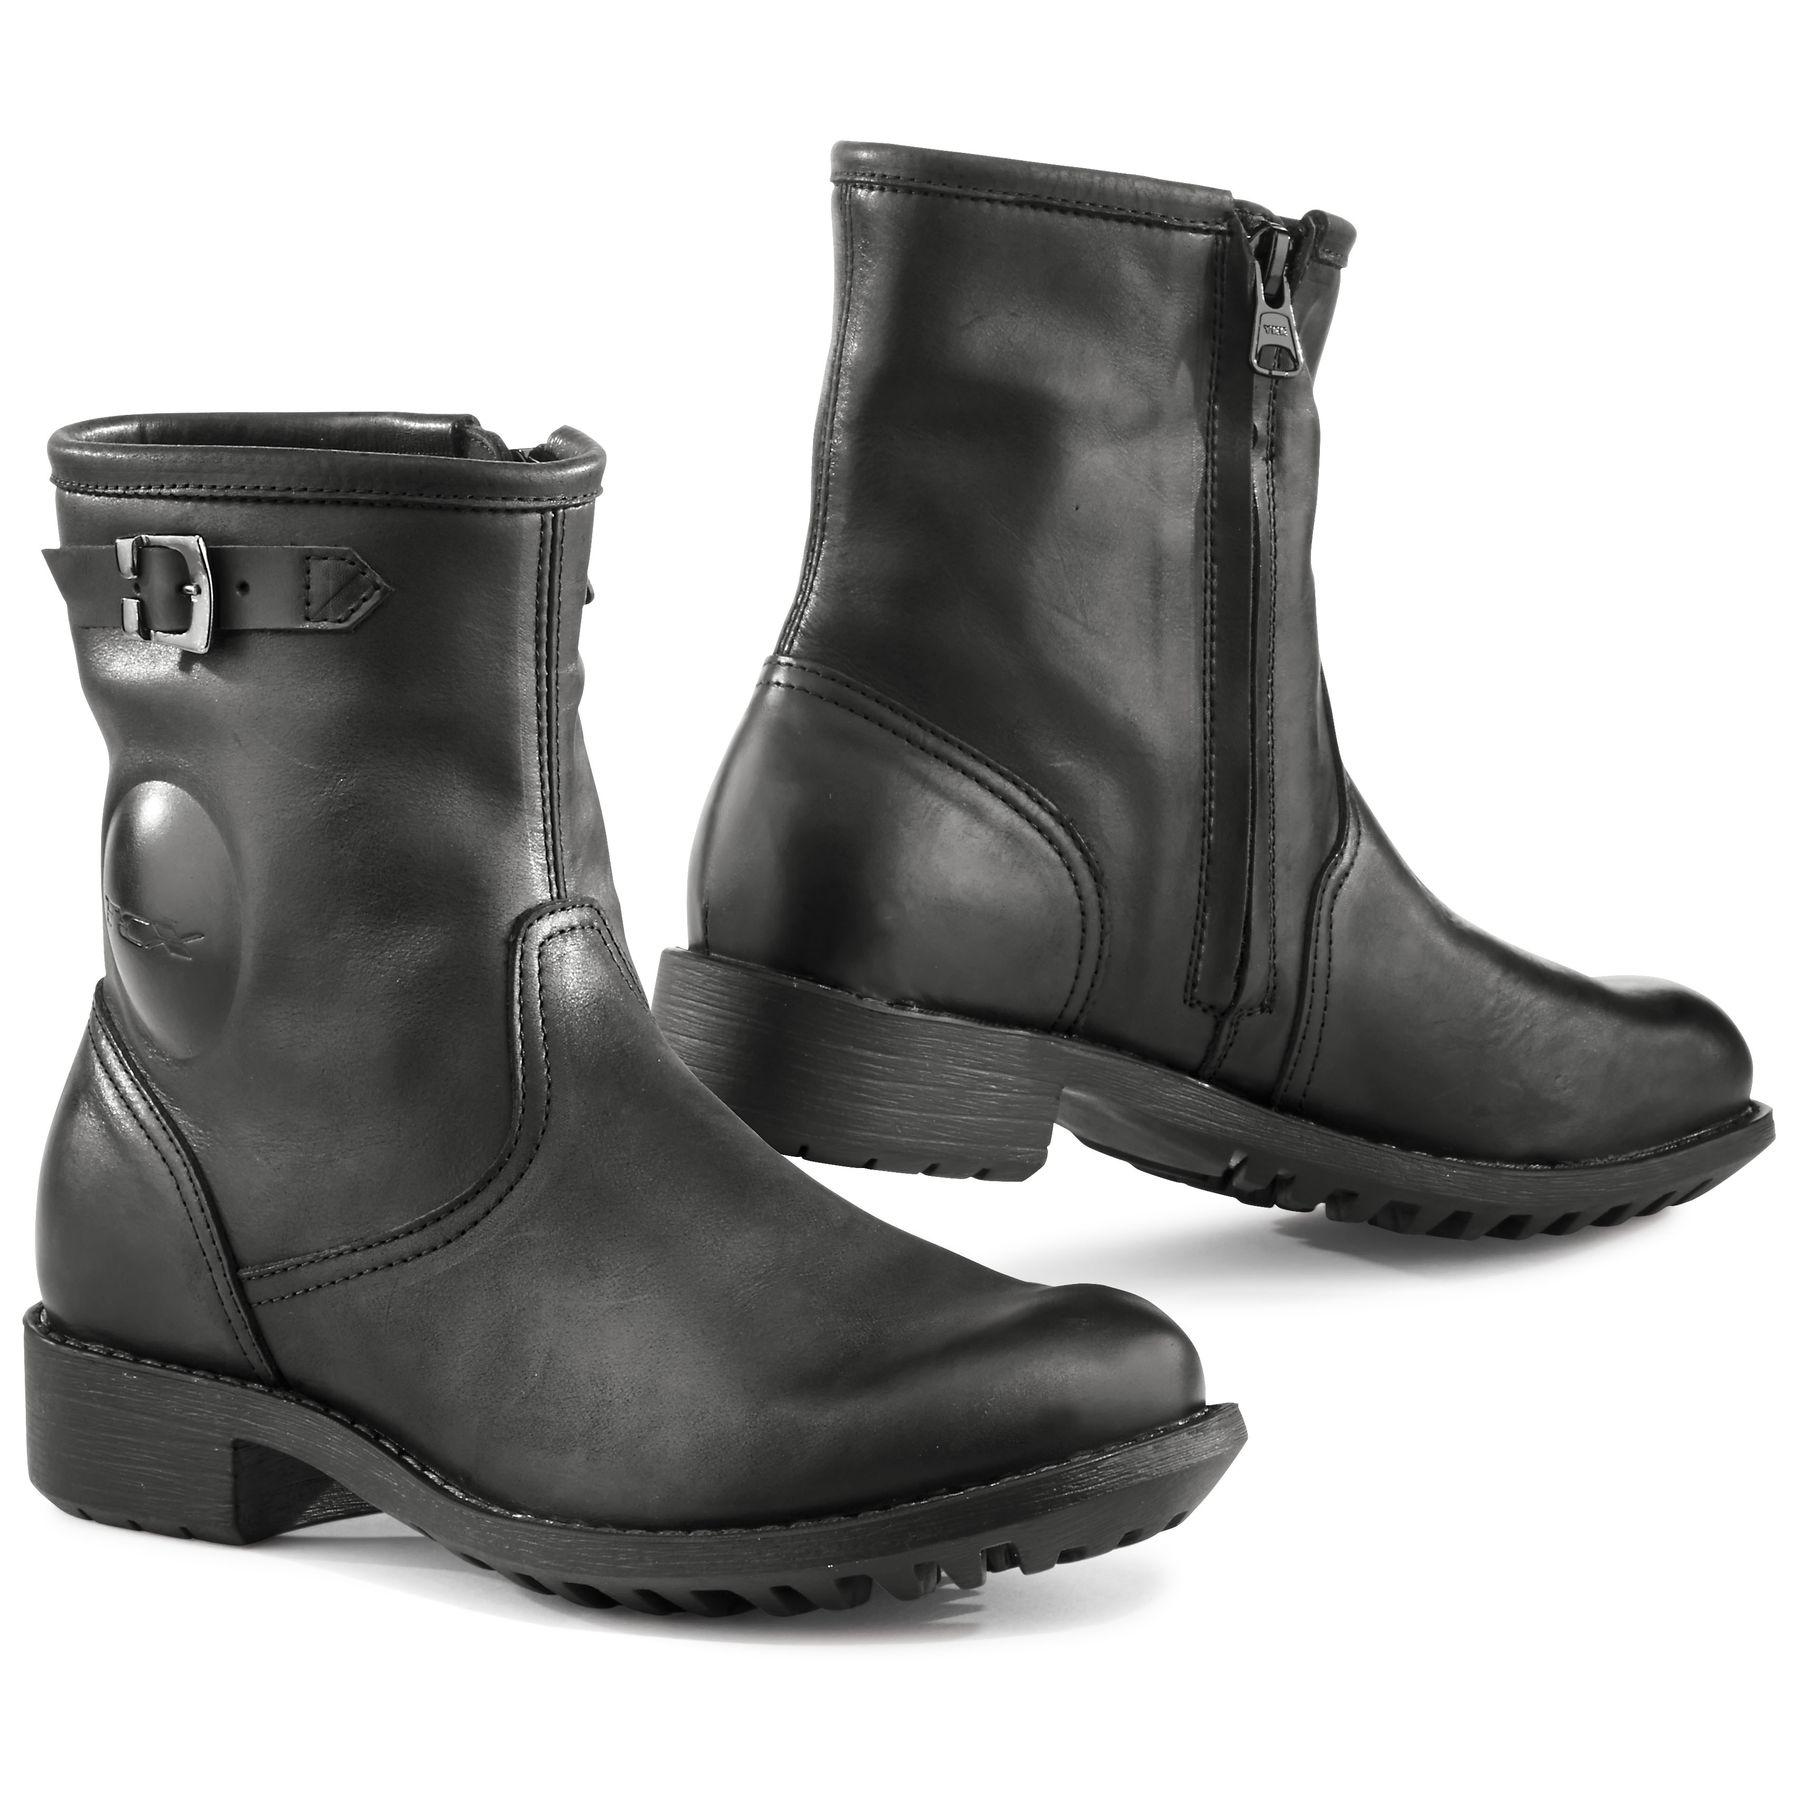 TCX Biker WP Women's Boots - RevZilla